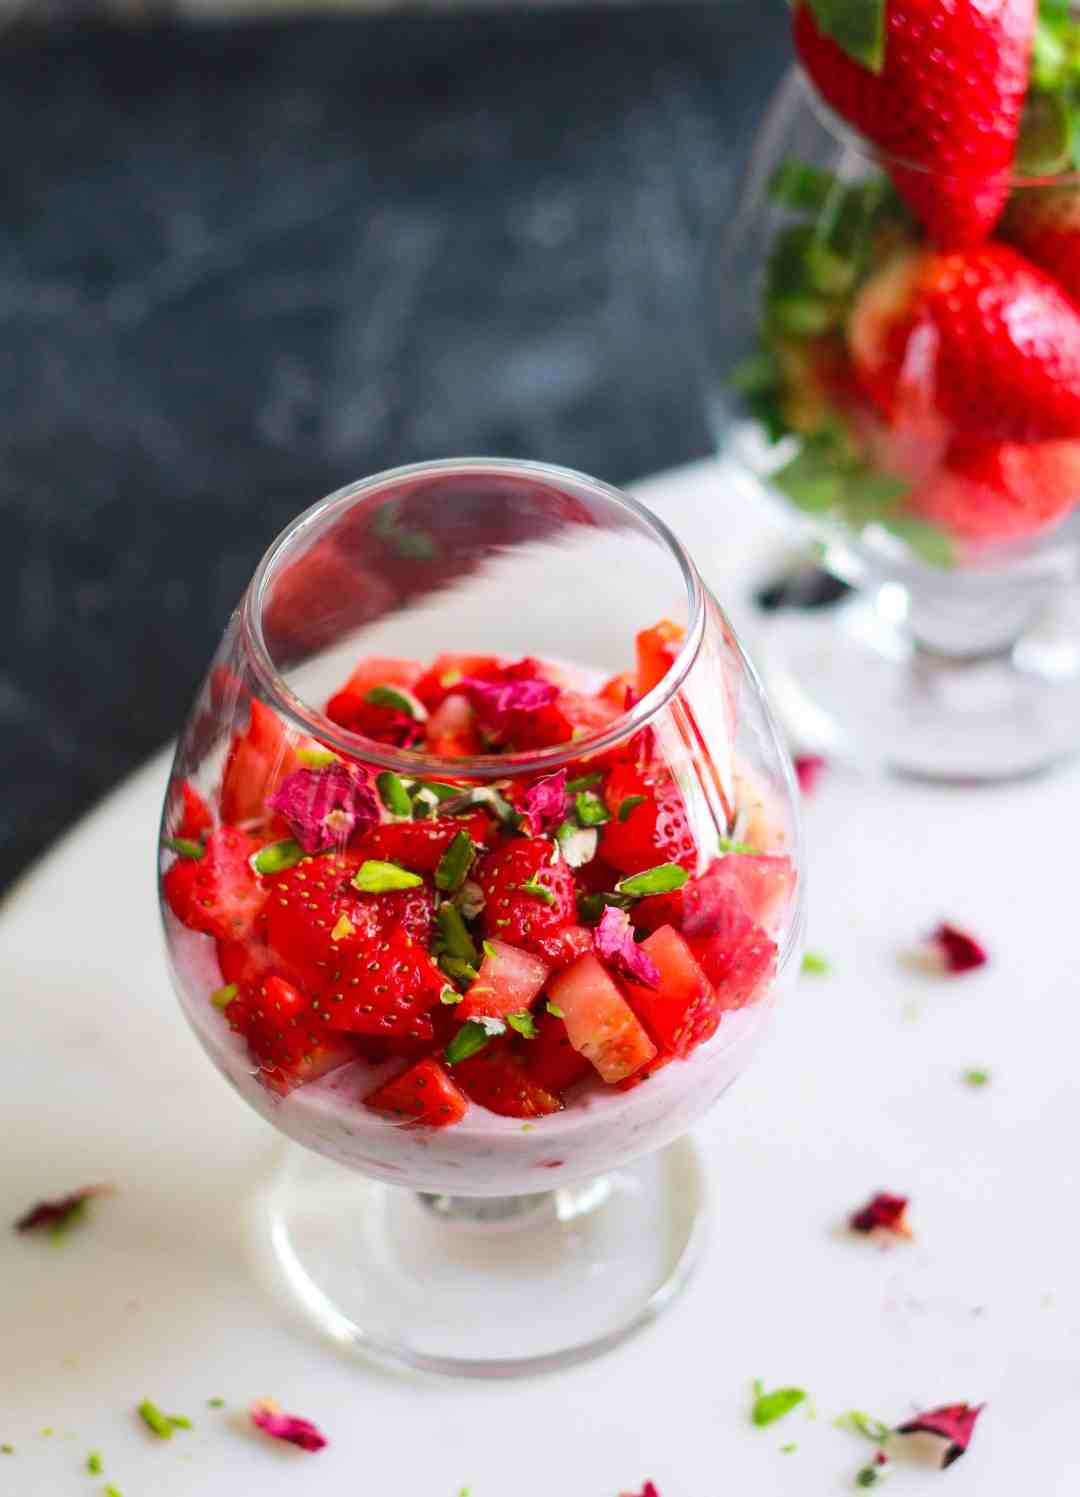 Strawberry Rose Chia Pudding glutenfree easy healthy recipe